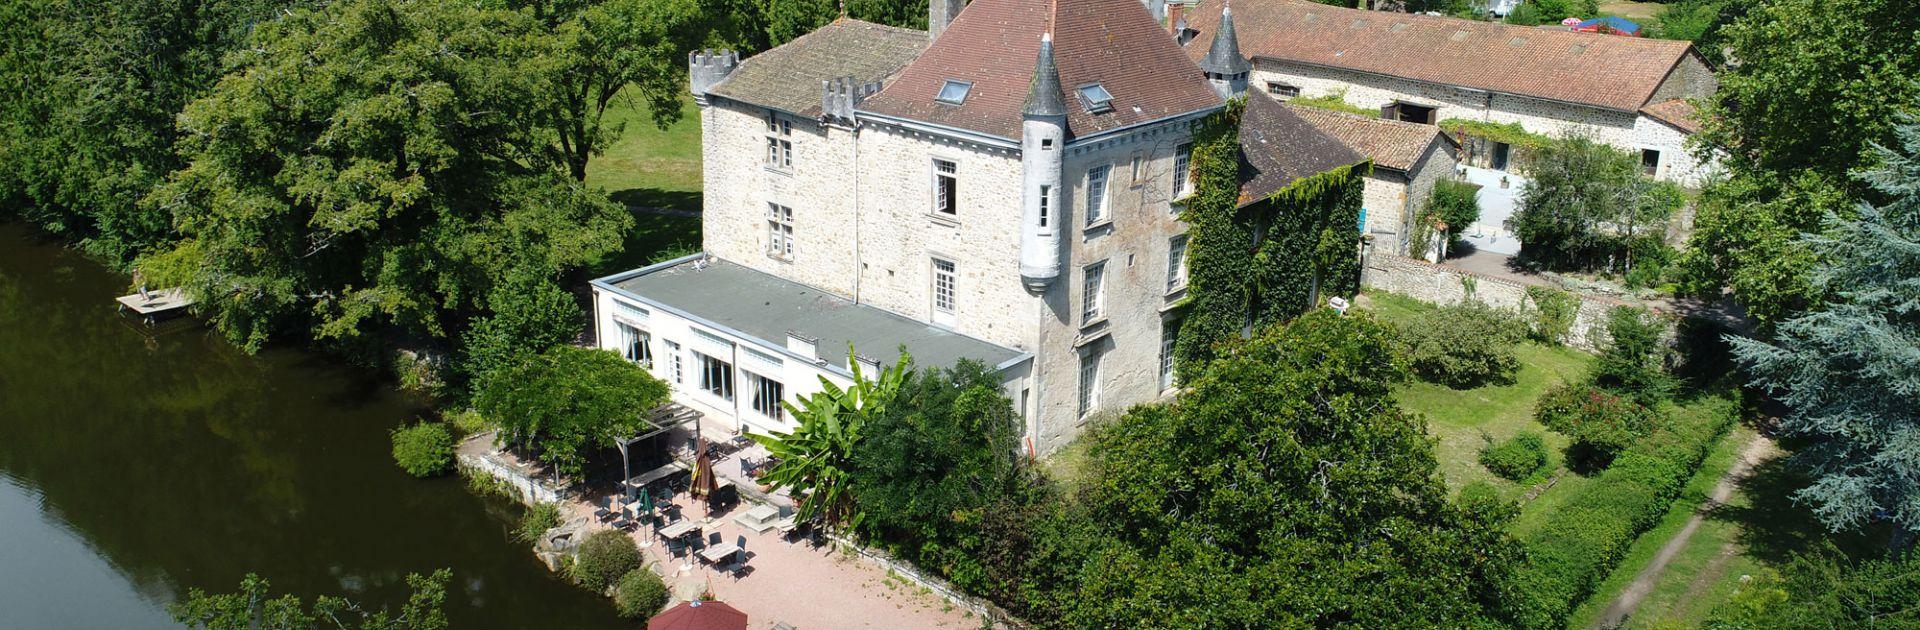 Château le Verdoyer Périgord Vert